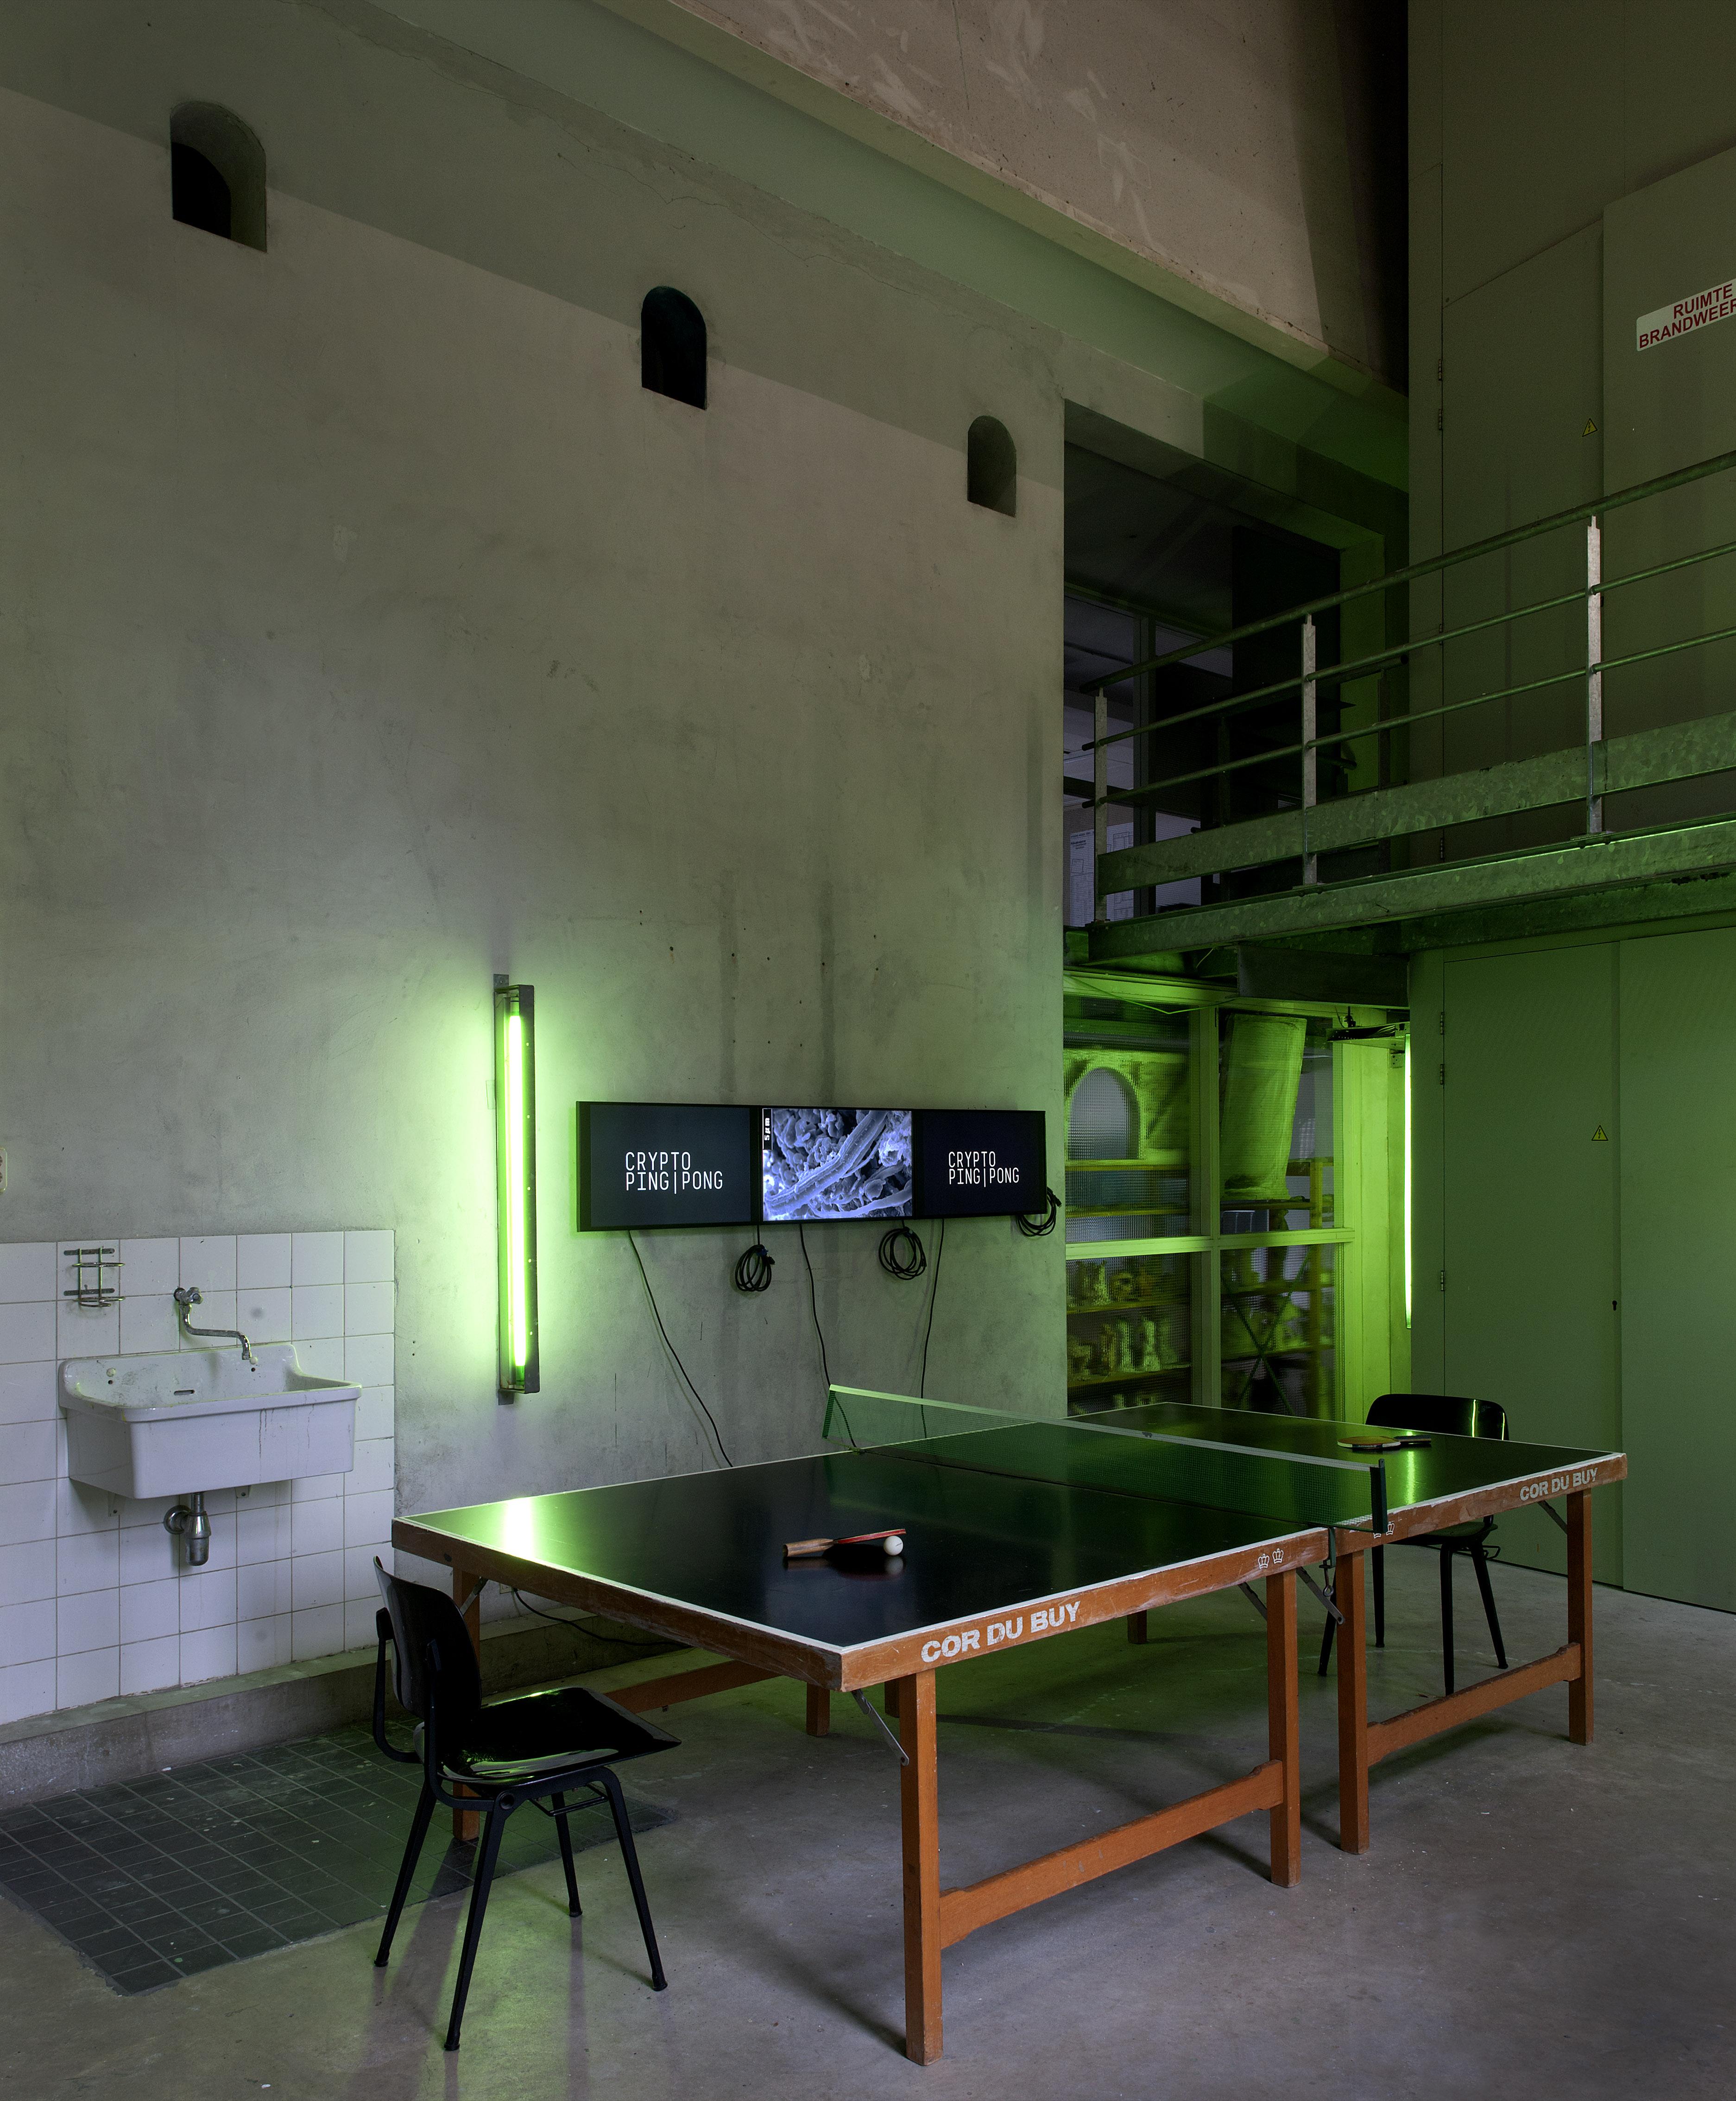 004.ANA MARIA & FEMKE -RIJKS ACADEMIE OPEN 2018-PH.GJ.vanROOIJ